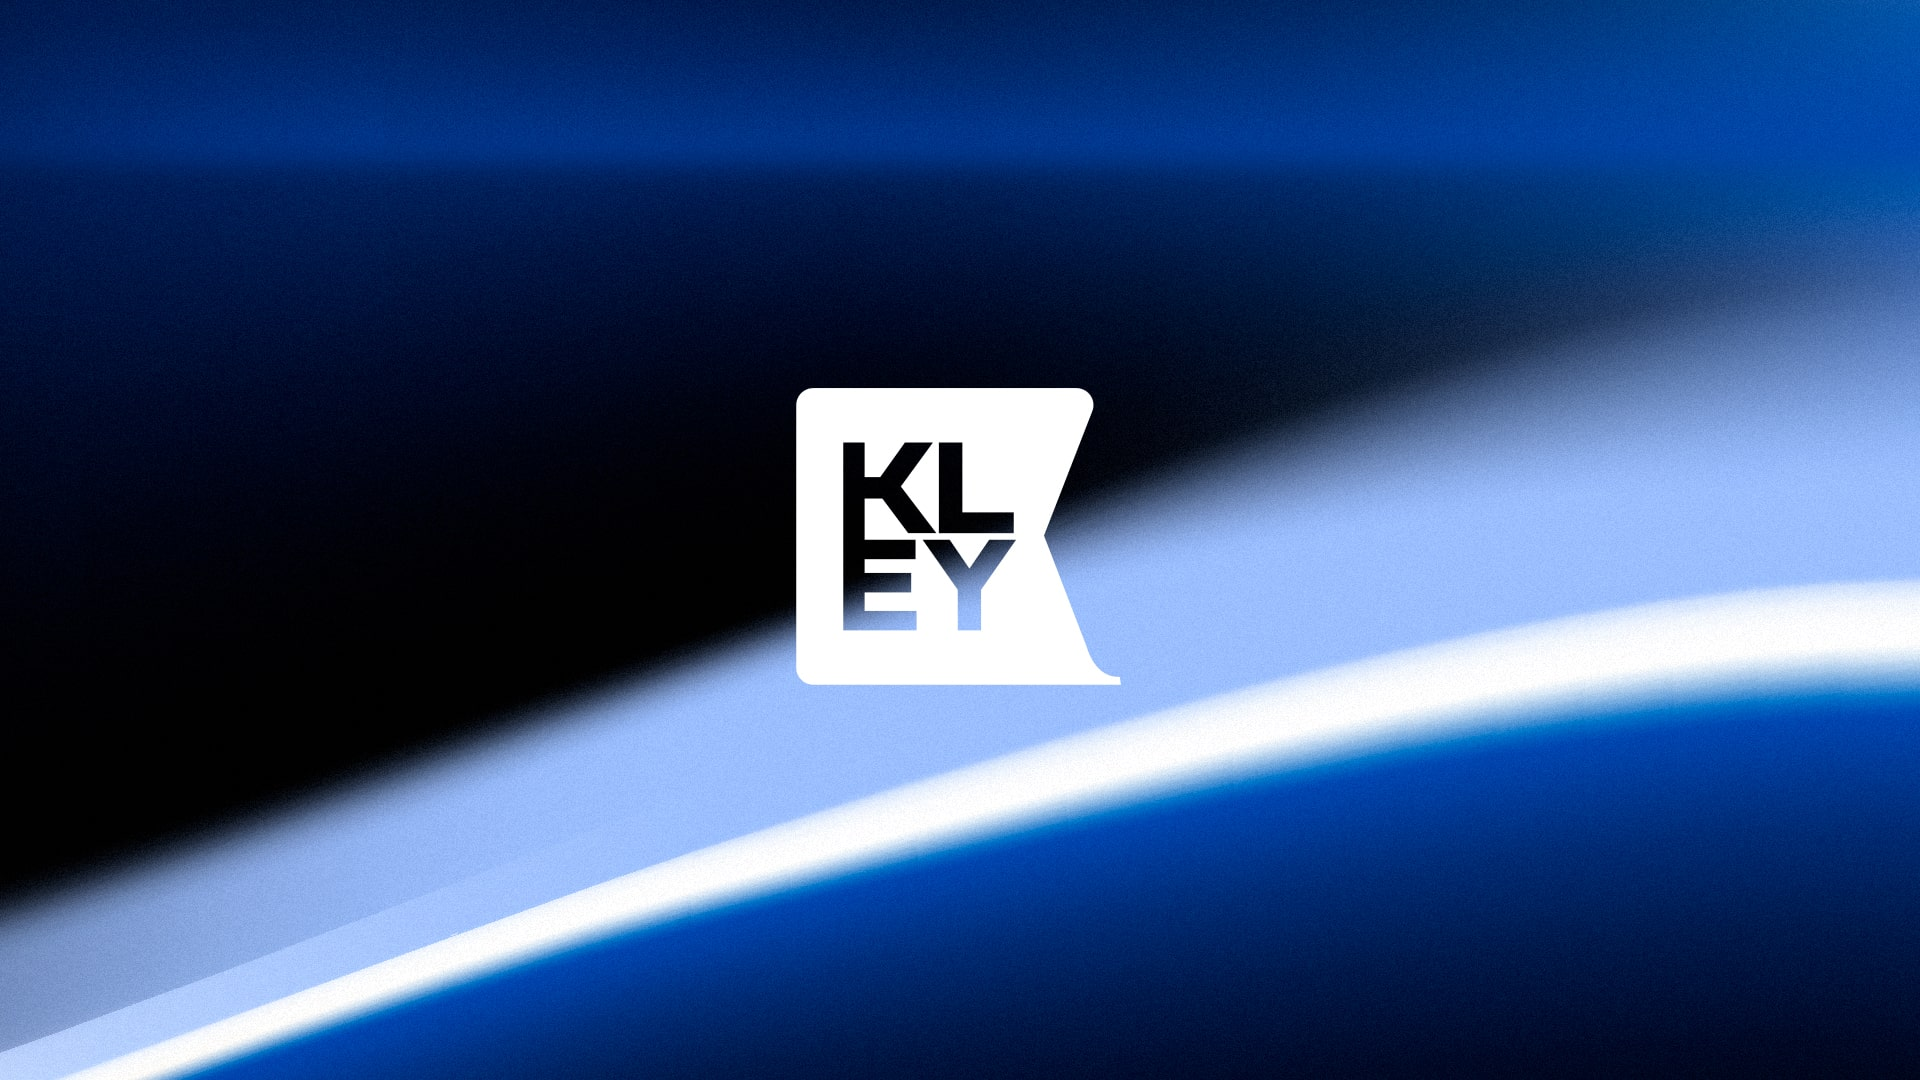 KLEY_Works-min